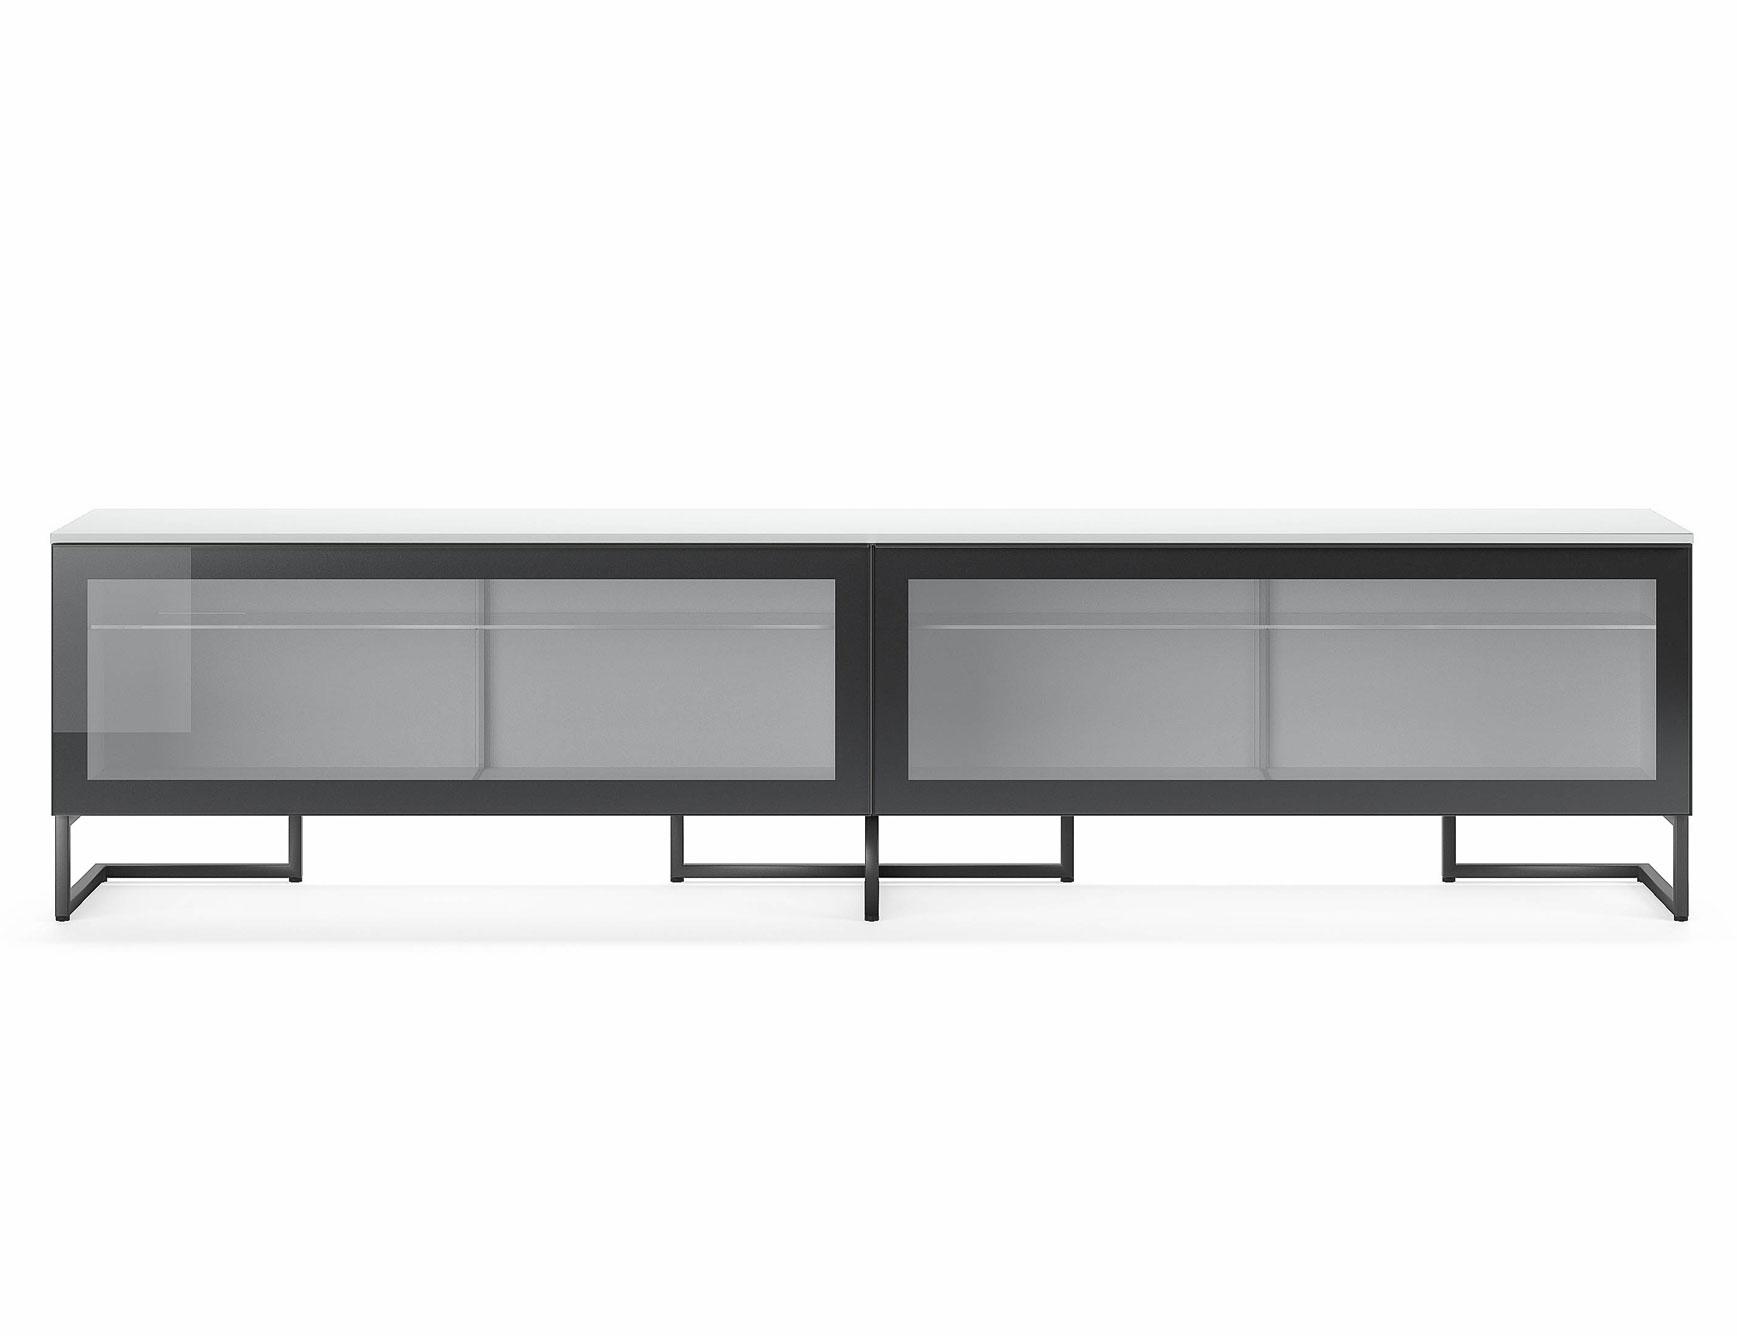 Nella Vetrina Pianca Spazio Sgm240 Contemporary Italian Tv Unit In Regarding Most Current Black Burnt Oak Sideboards (View 14 of 20)